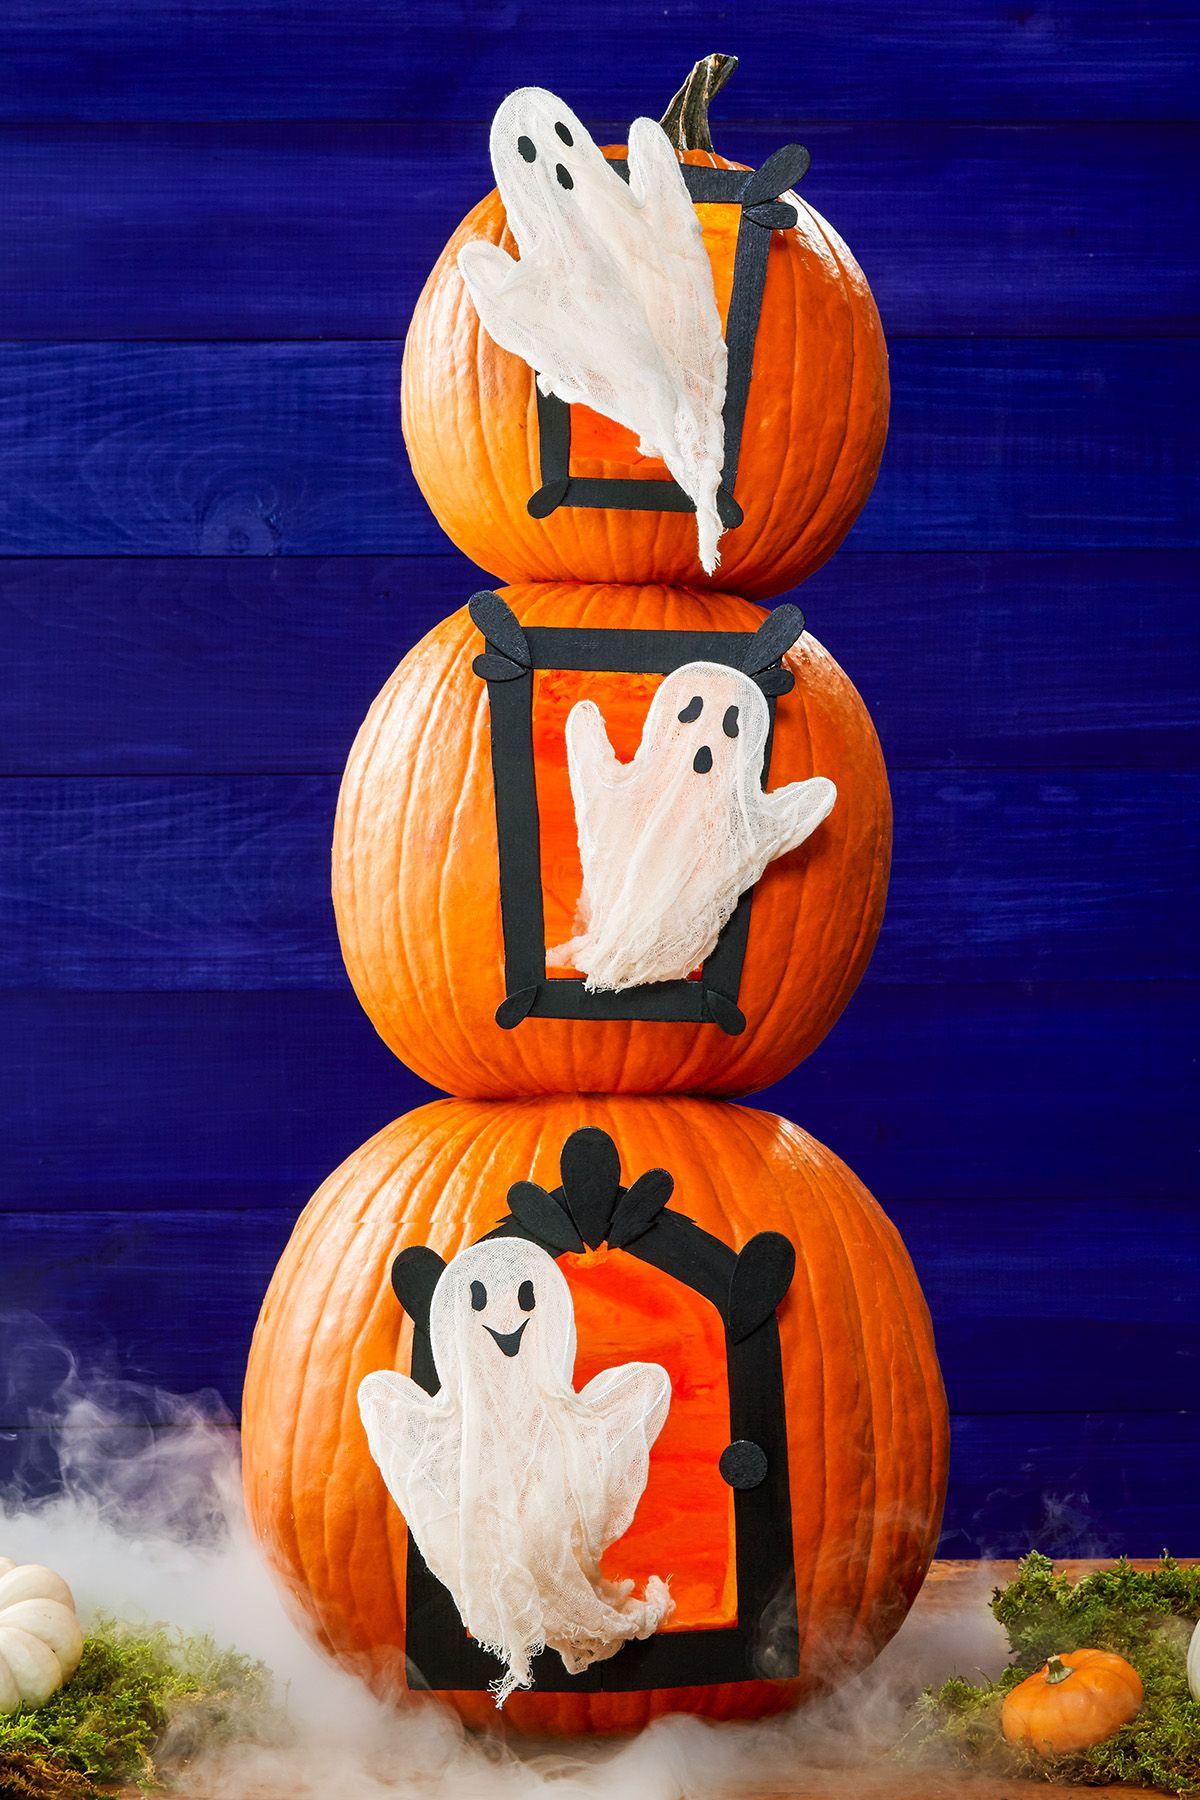 60 Best Pumpkin Carving Ideas Halloween 2018 Creative Jack O Lantern Designs